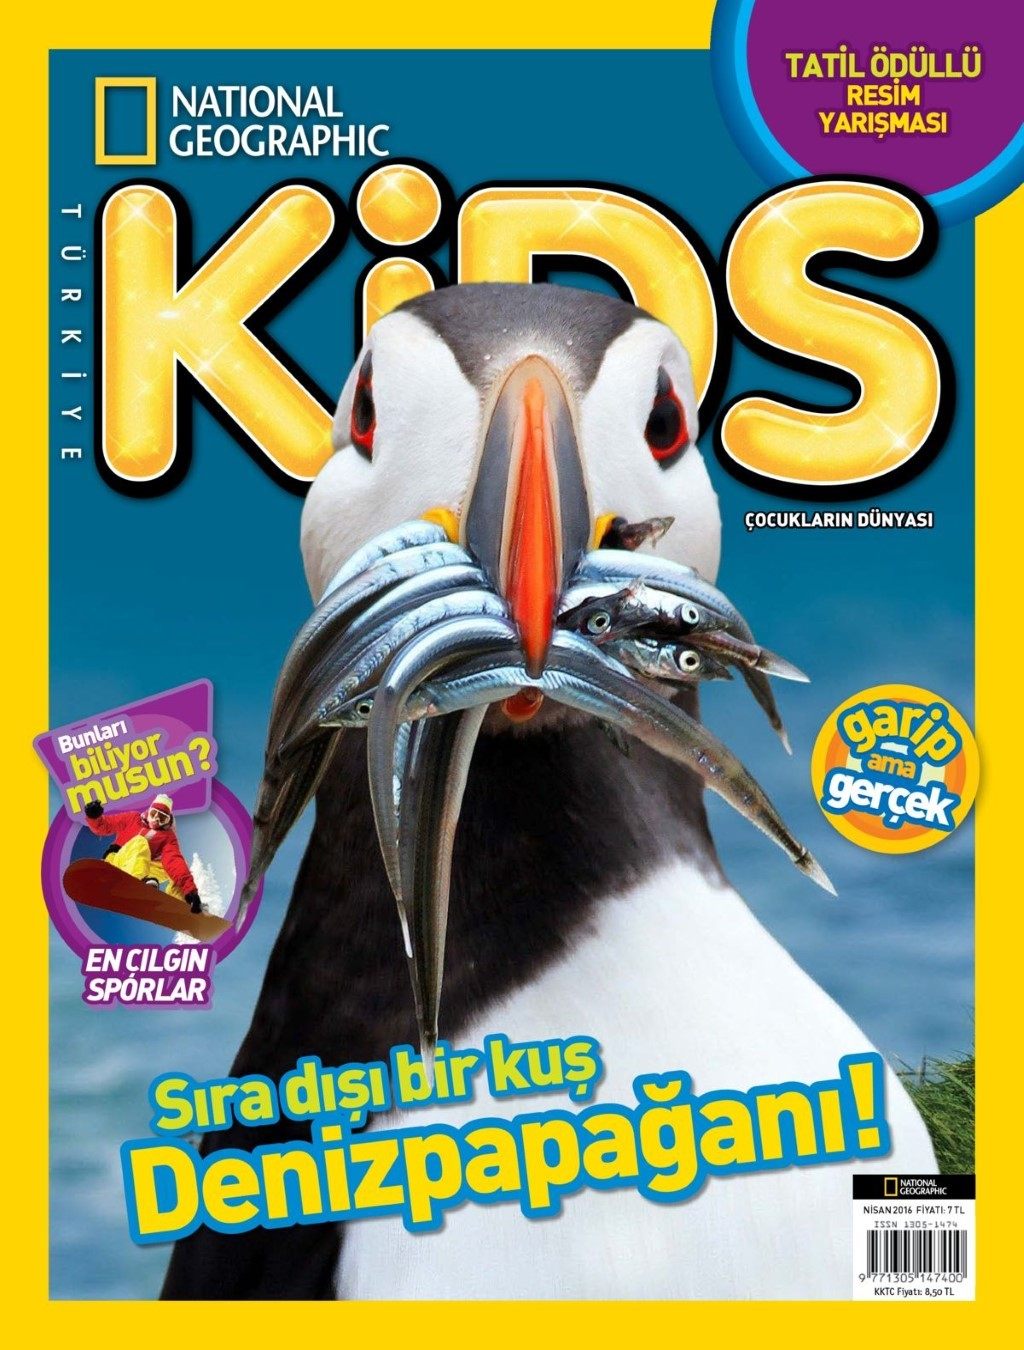 National Geographic Kids Nisan E-dergi indir Sandalca.com